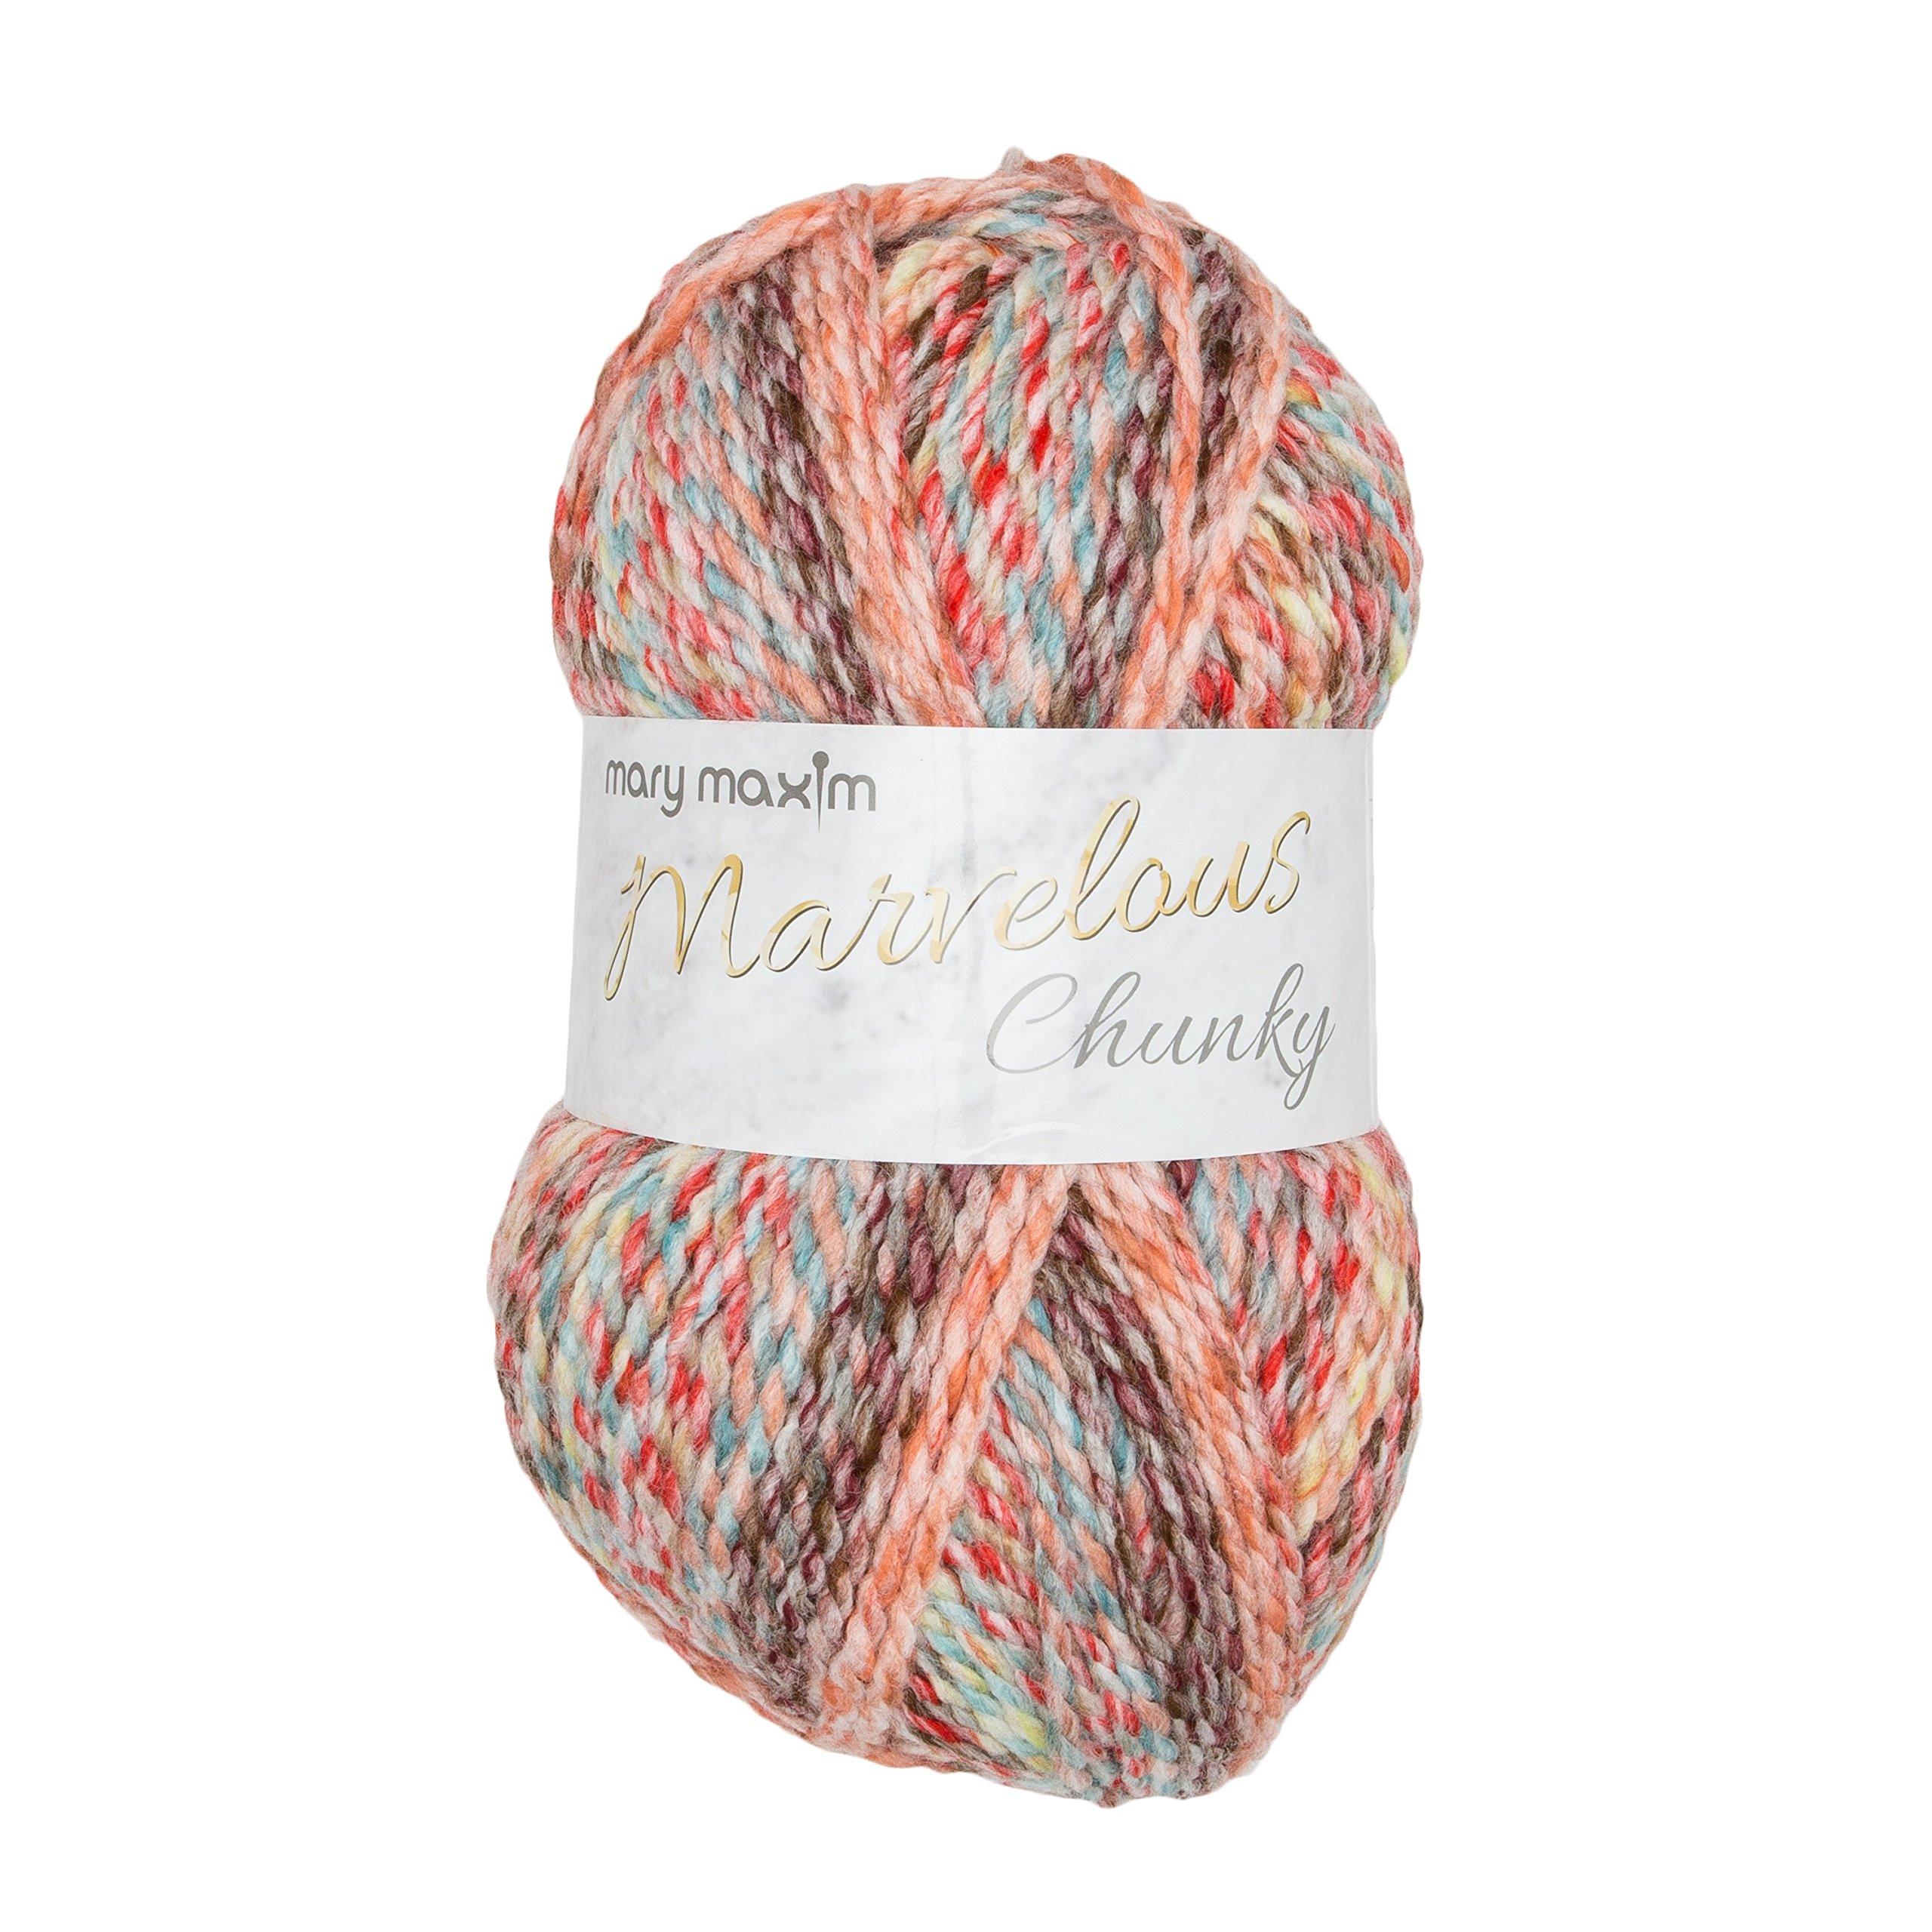 Knit Hat Patterns Straight Needles - 1000 Free Patterns